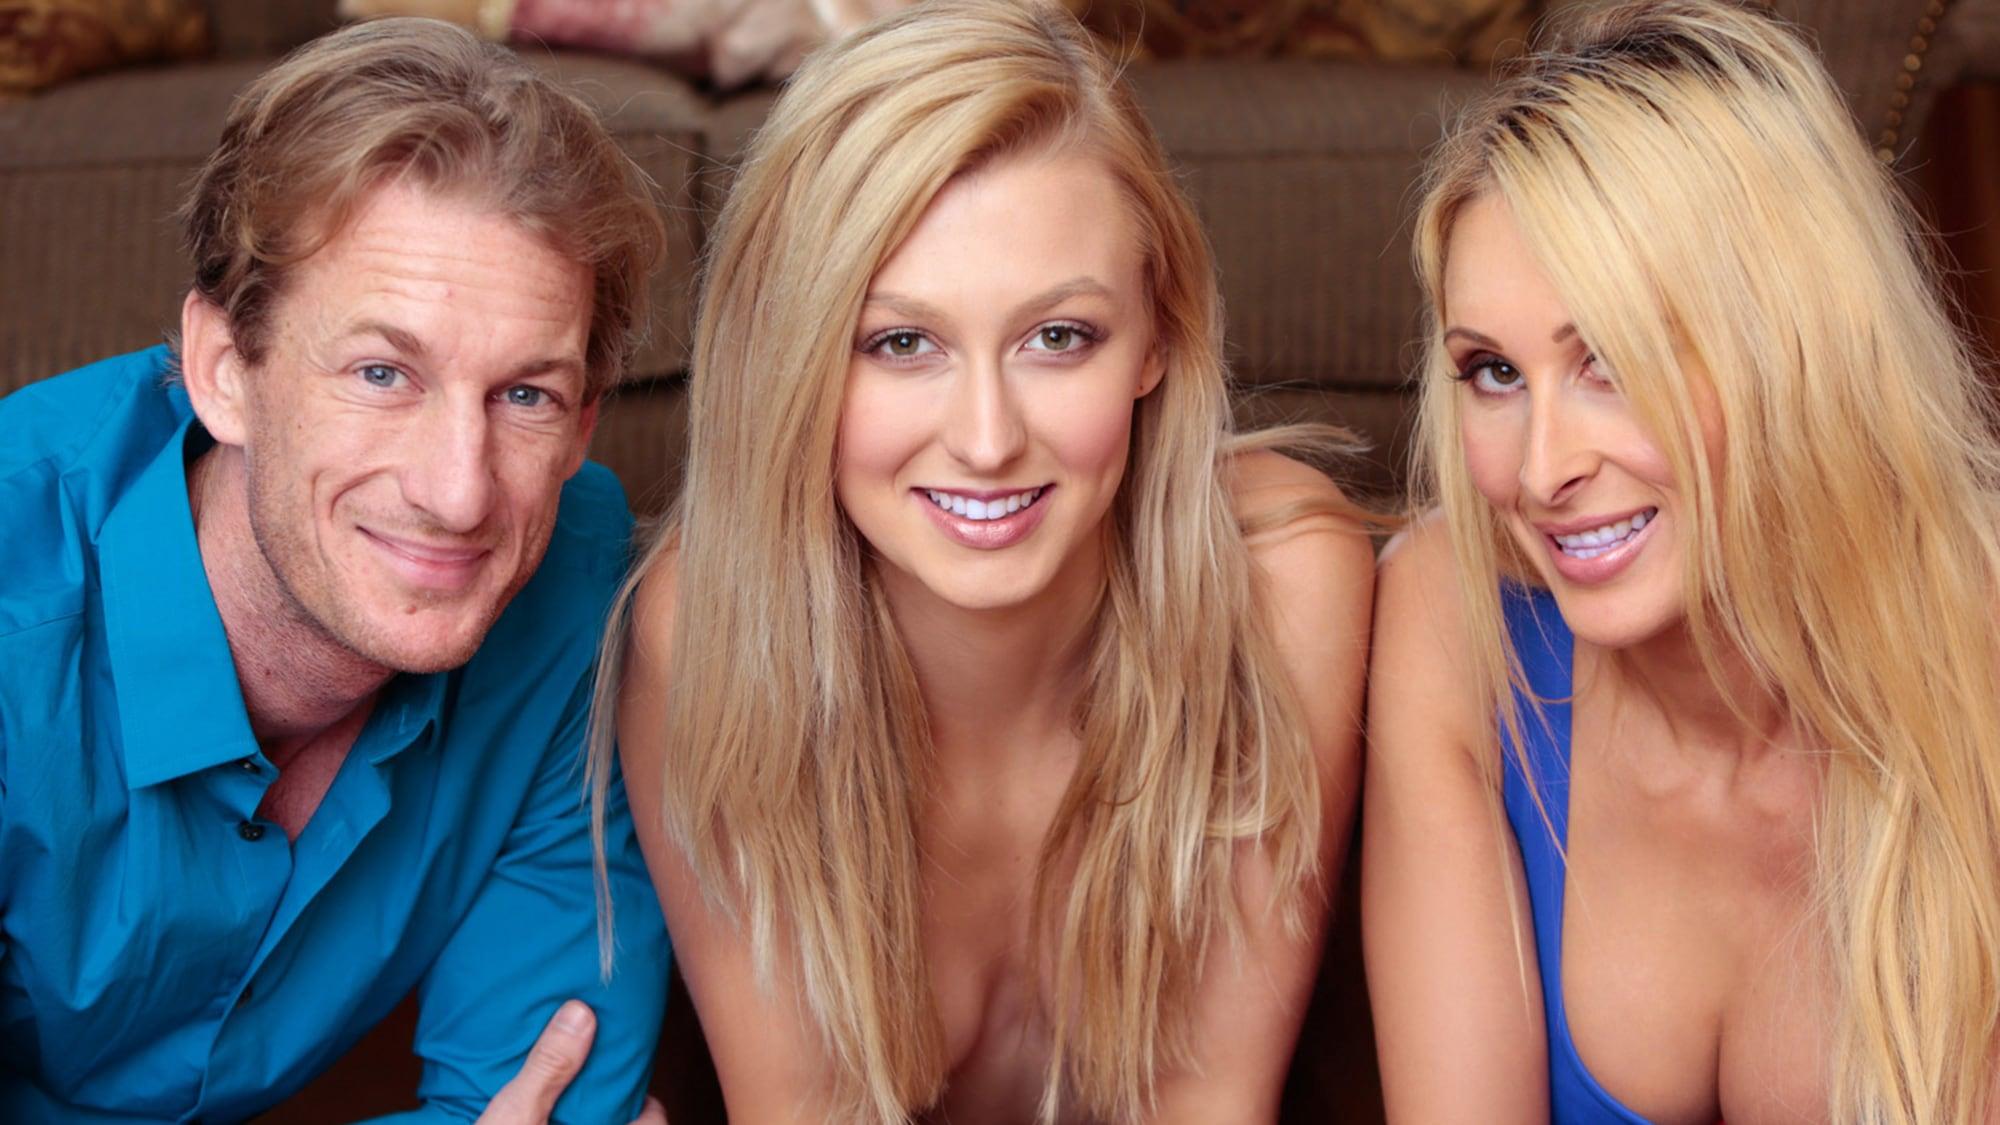 Milf Step Mom Threesome